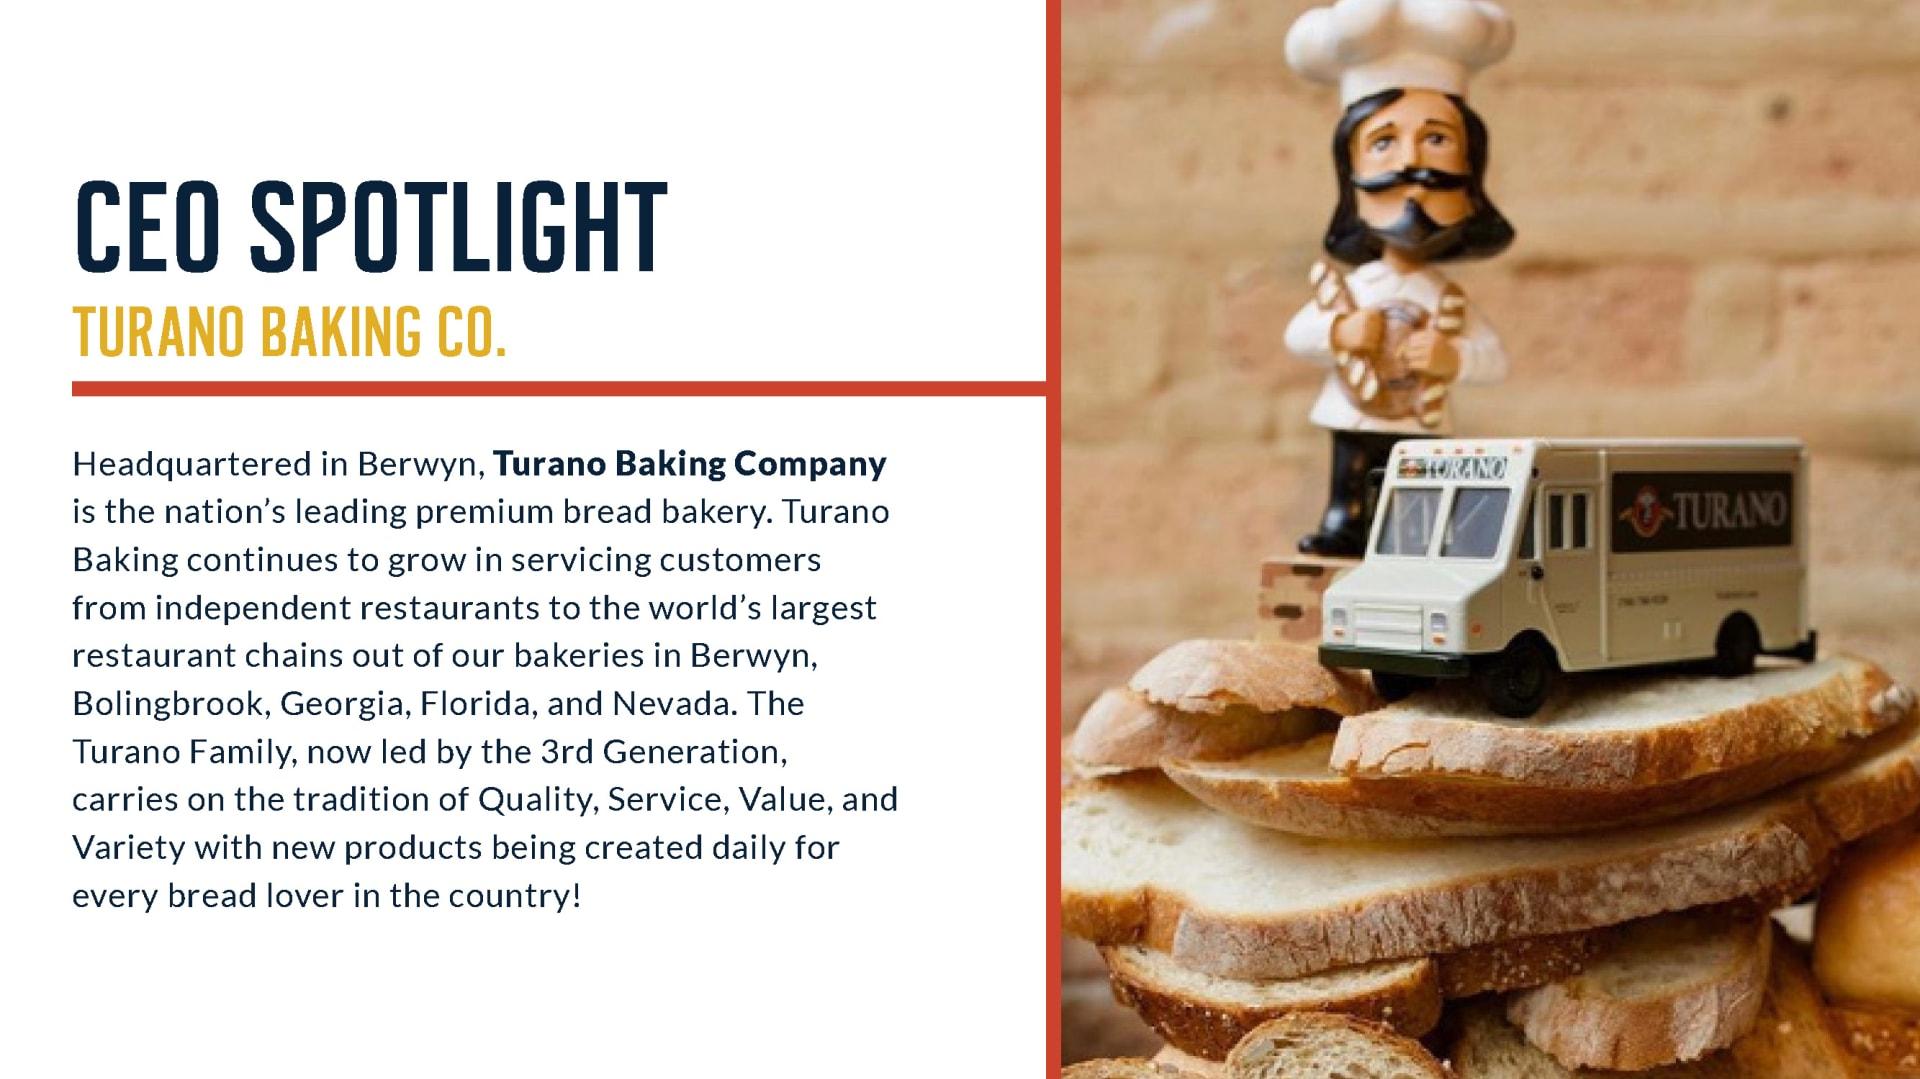 CEO-Spotlights-2020_Page_5-w1920.jpg